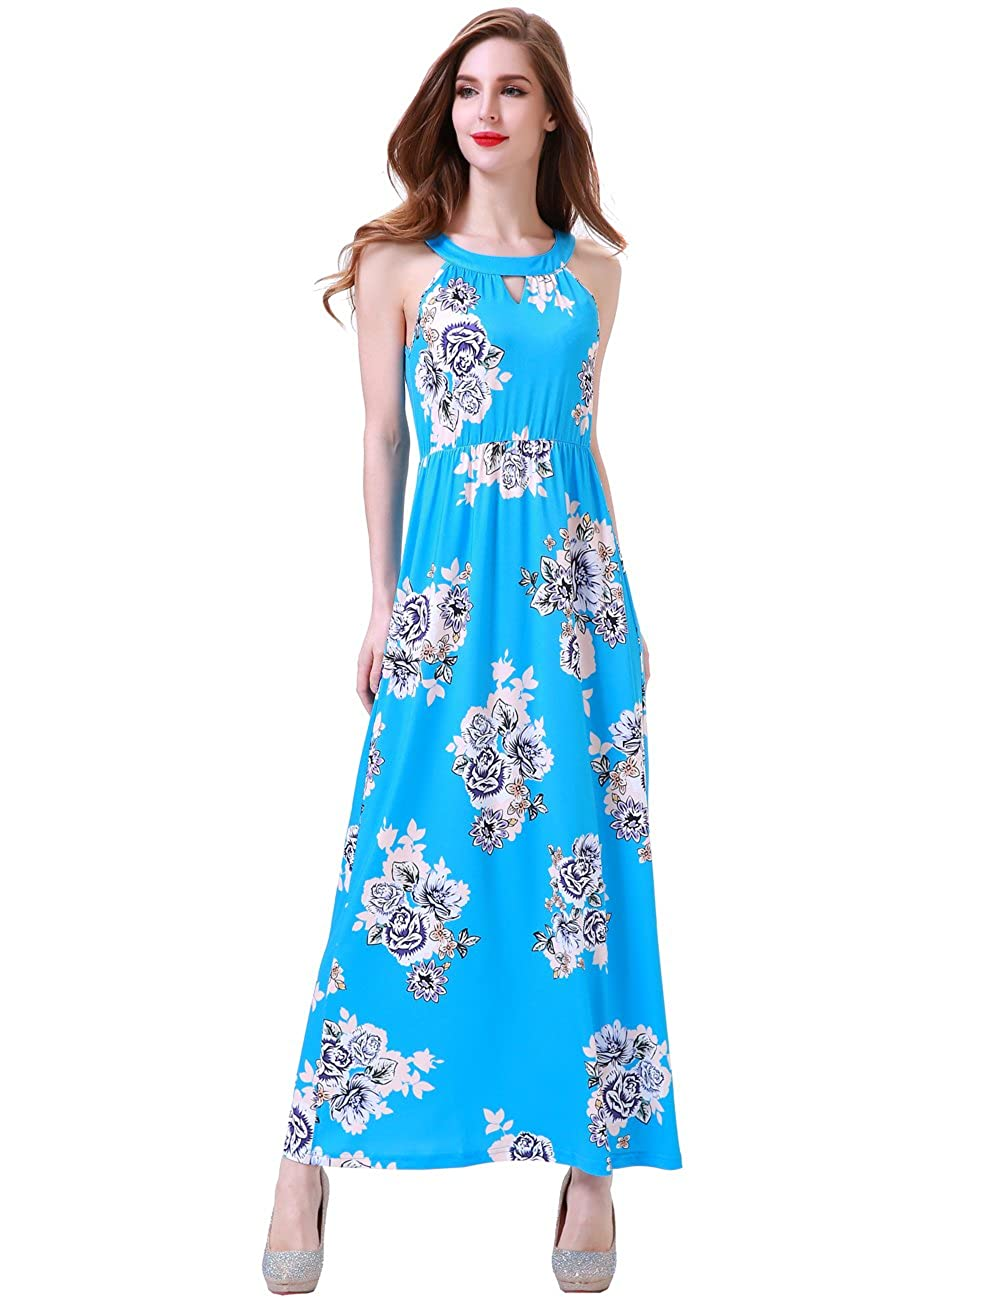 Top 10 wholesale Plus Size After Five Dresses - Chinabrands.com